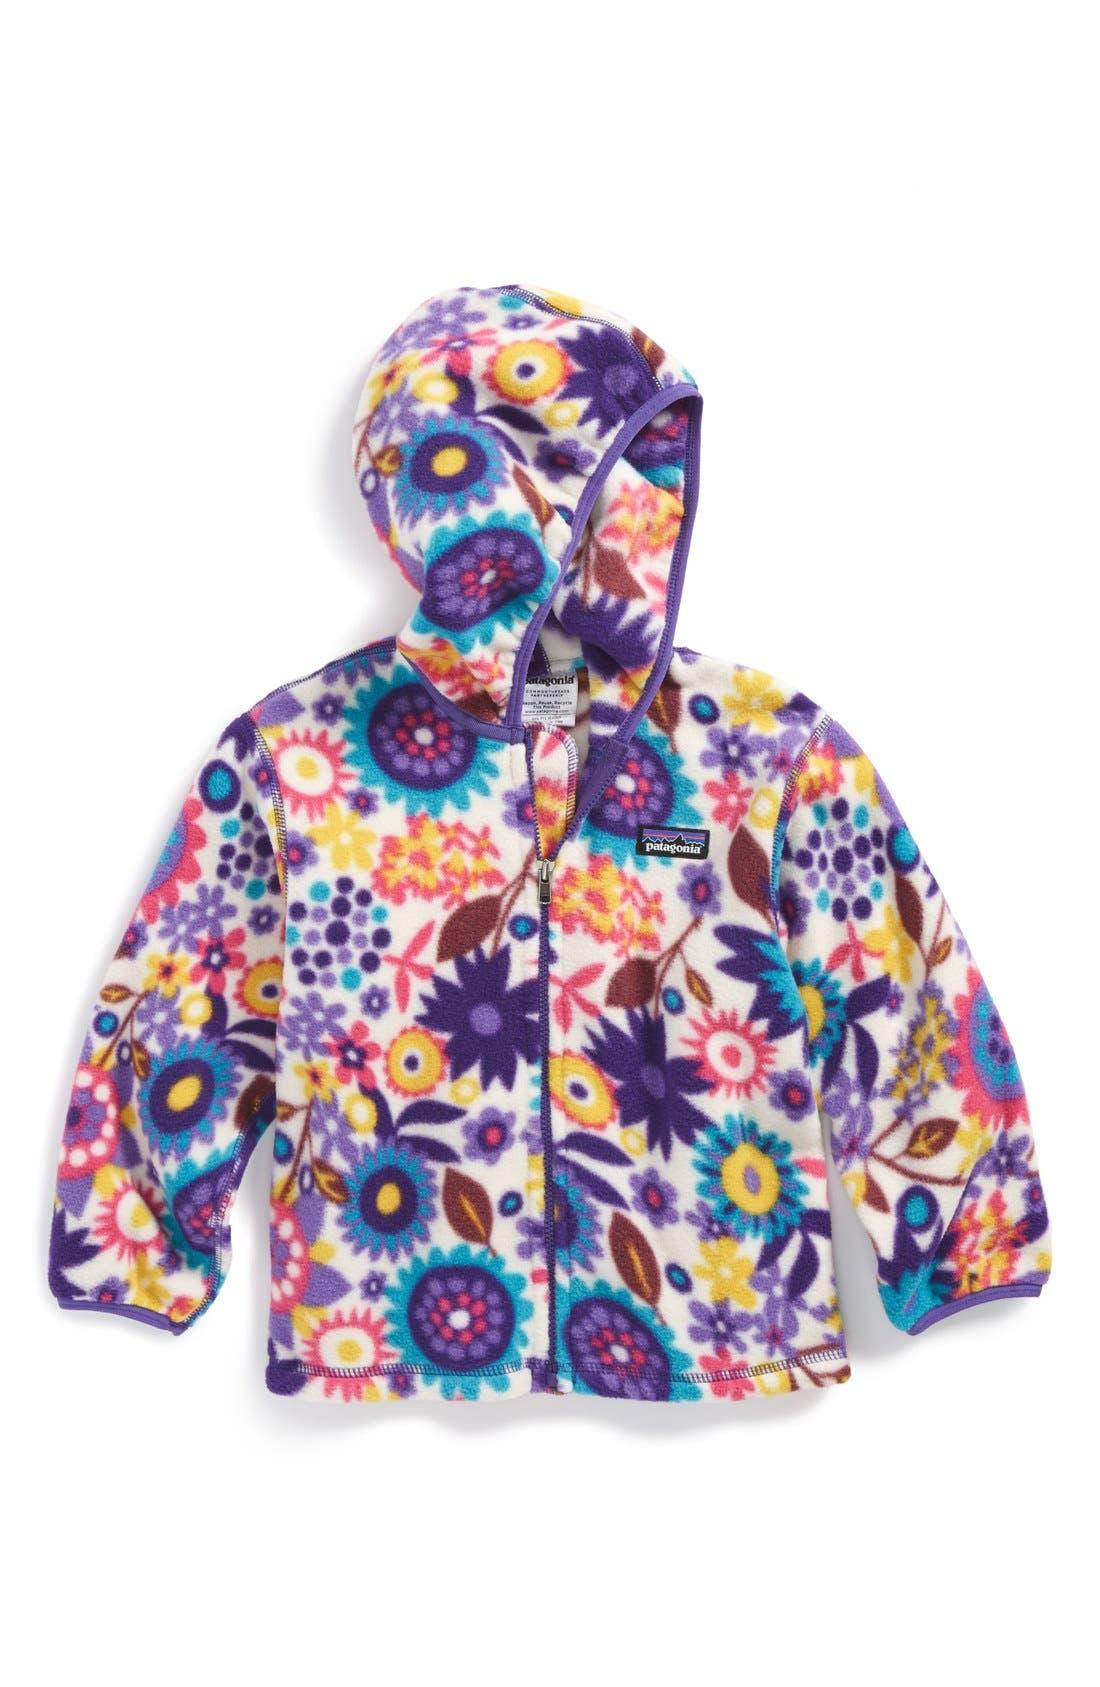 Alternate Image 1 Selected - Patagonia Hooded Synchilla® Fleece Jacket (Baby)